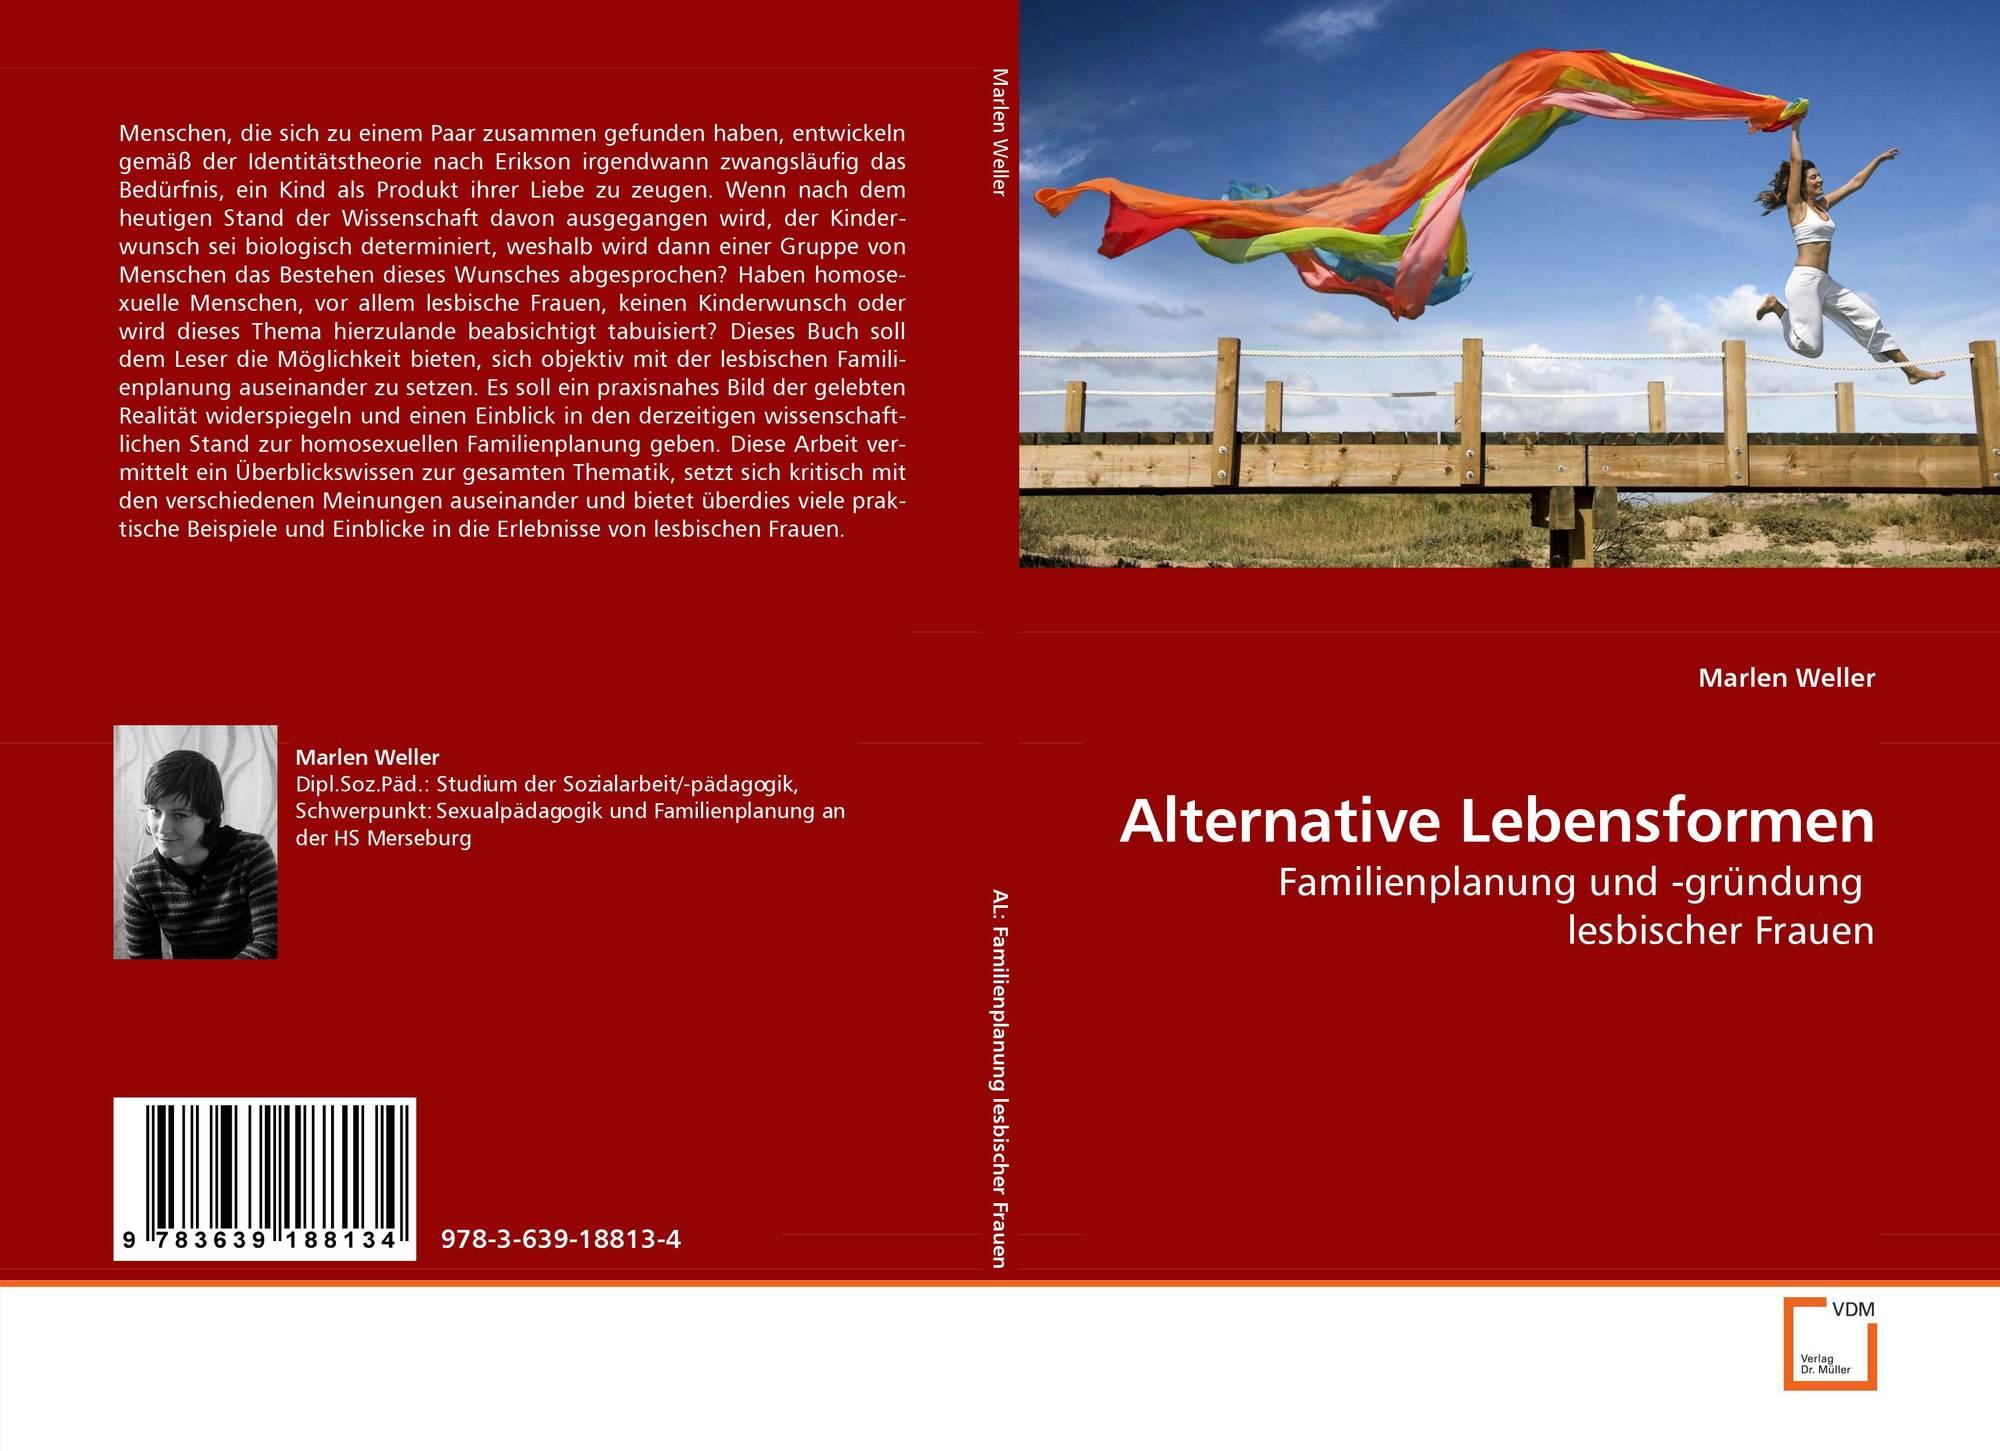 Alternative Lebensformen